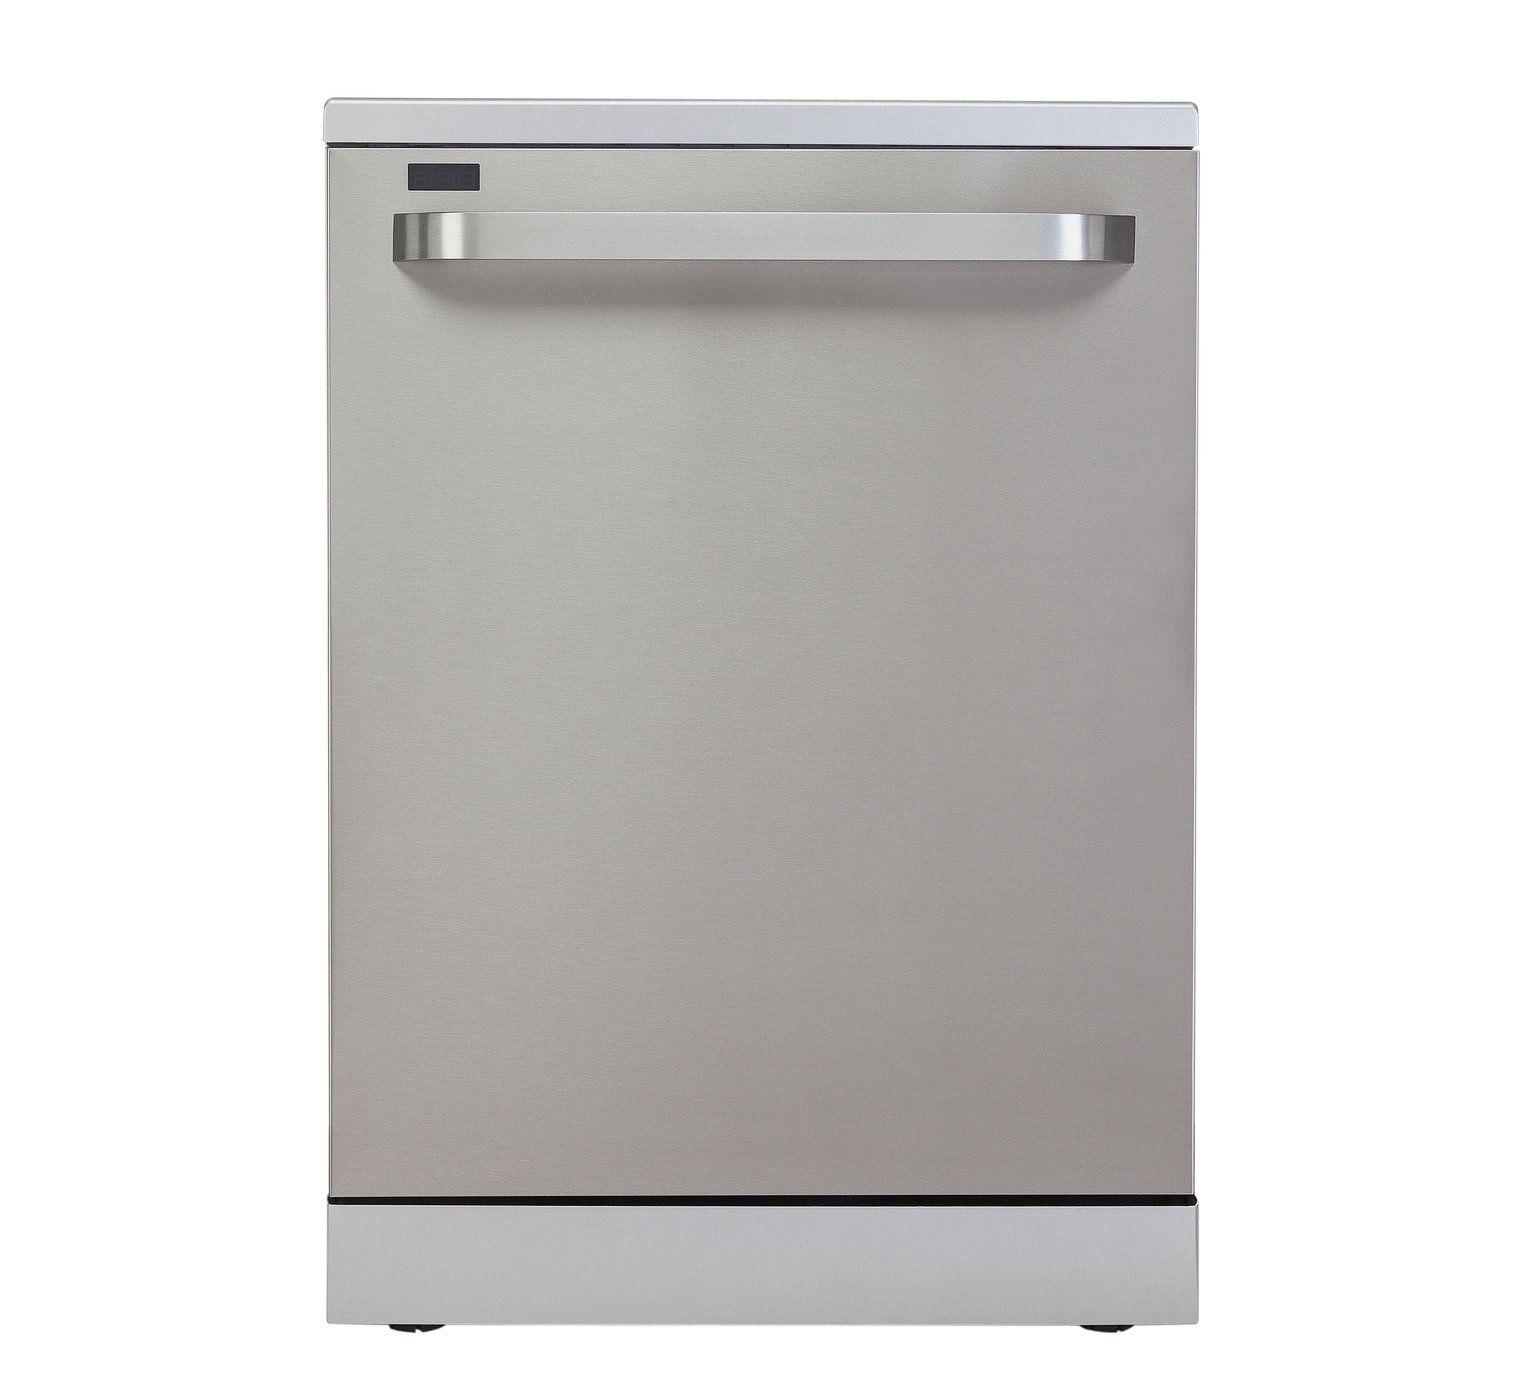 Buy Bush DWFSG146SS Full Size Dishwasher - Stainless Steel at Argos ...